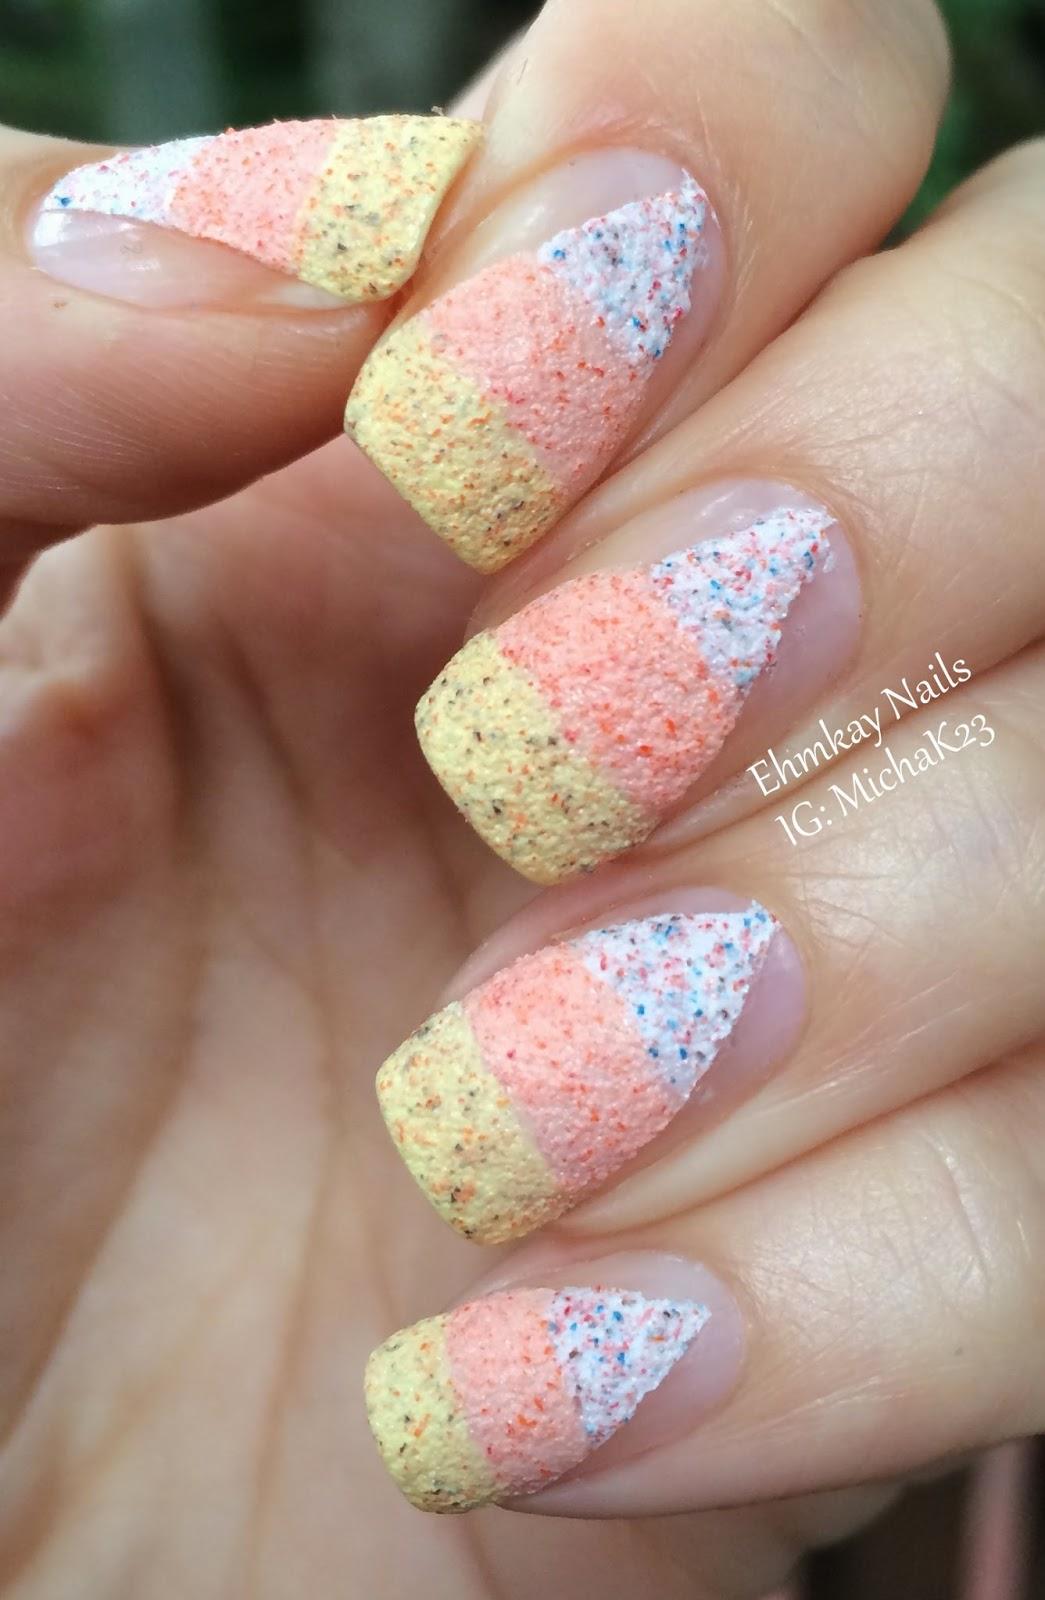 ehmkay nails: Textured Candy Corn Halloween Nail Art with ...